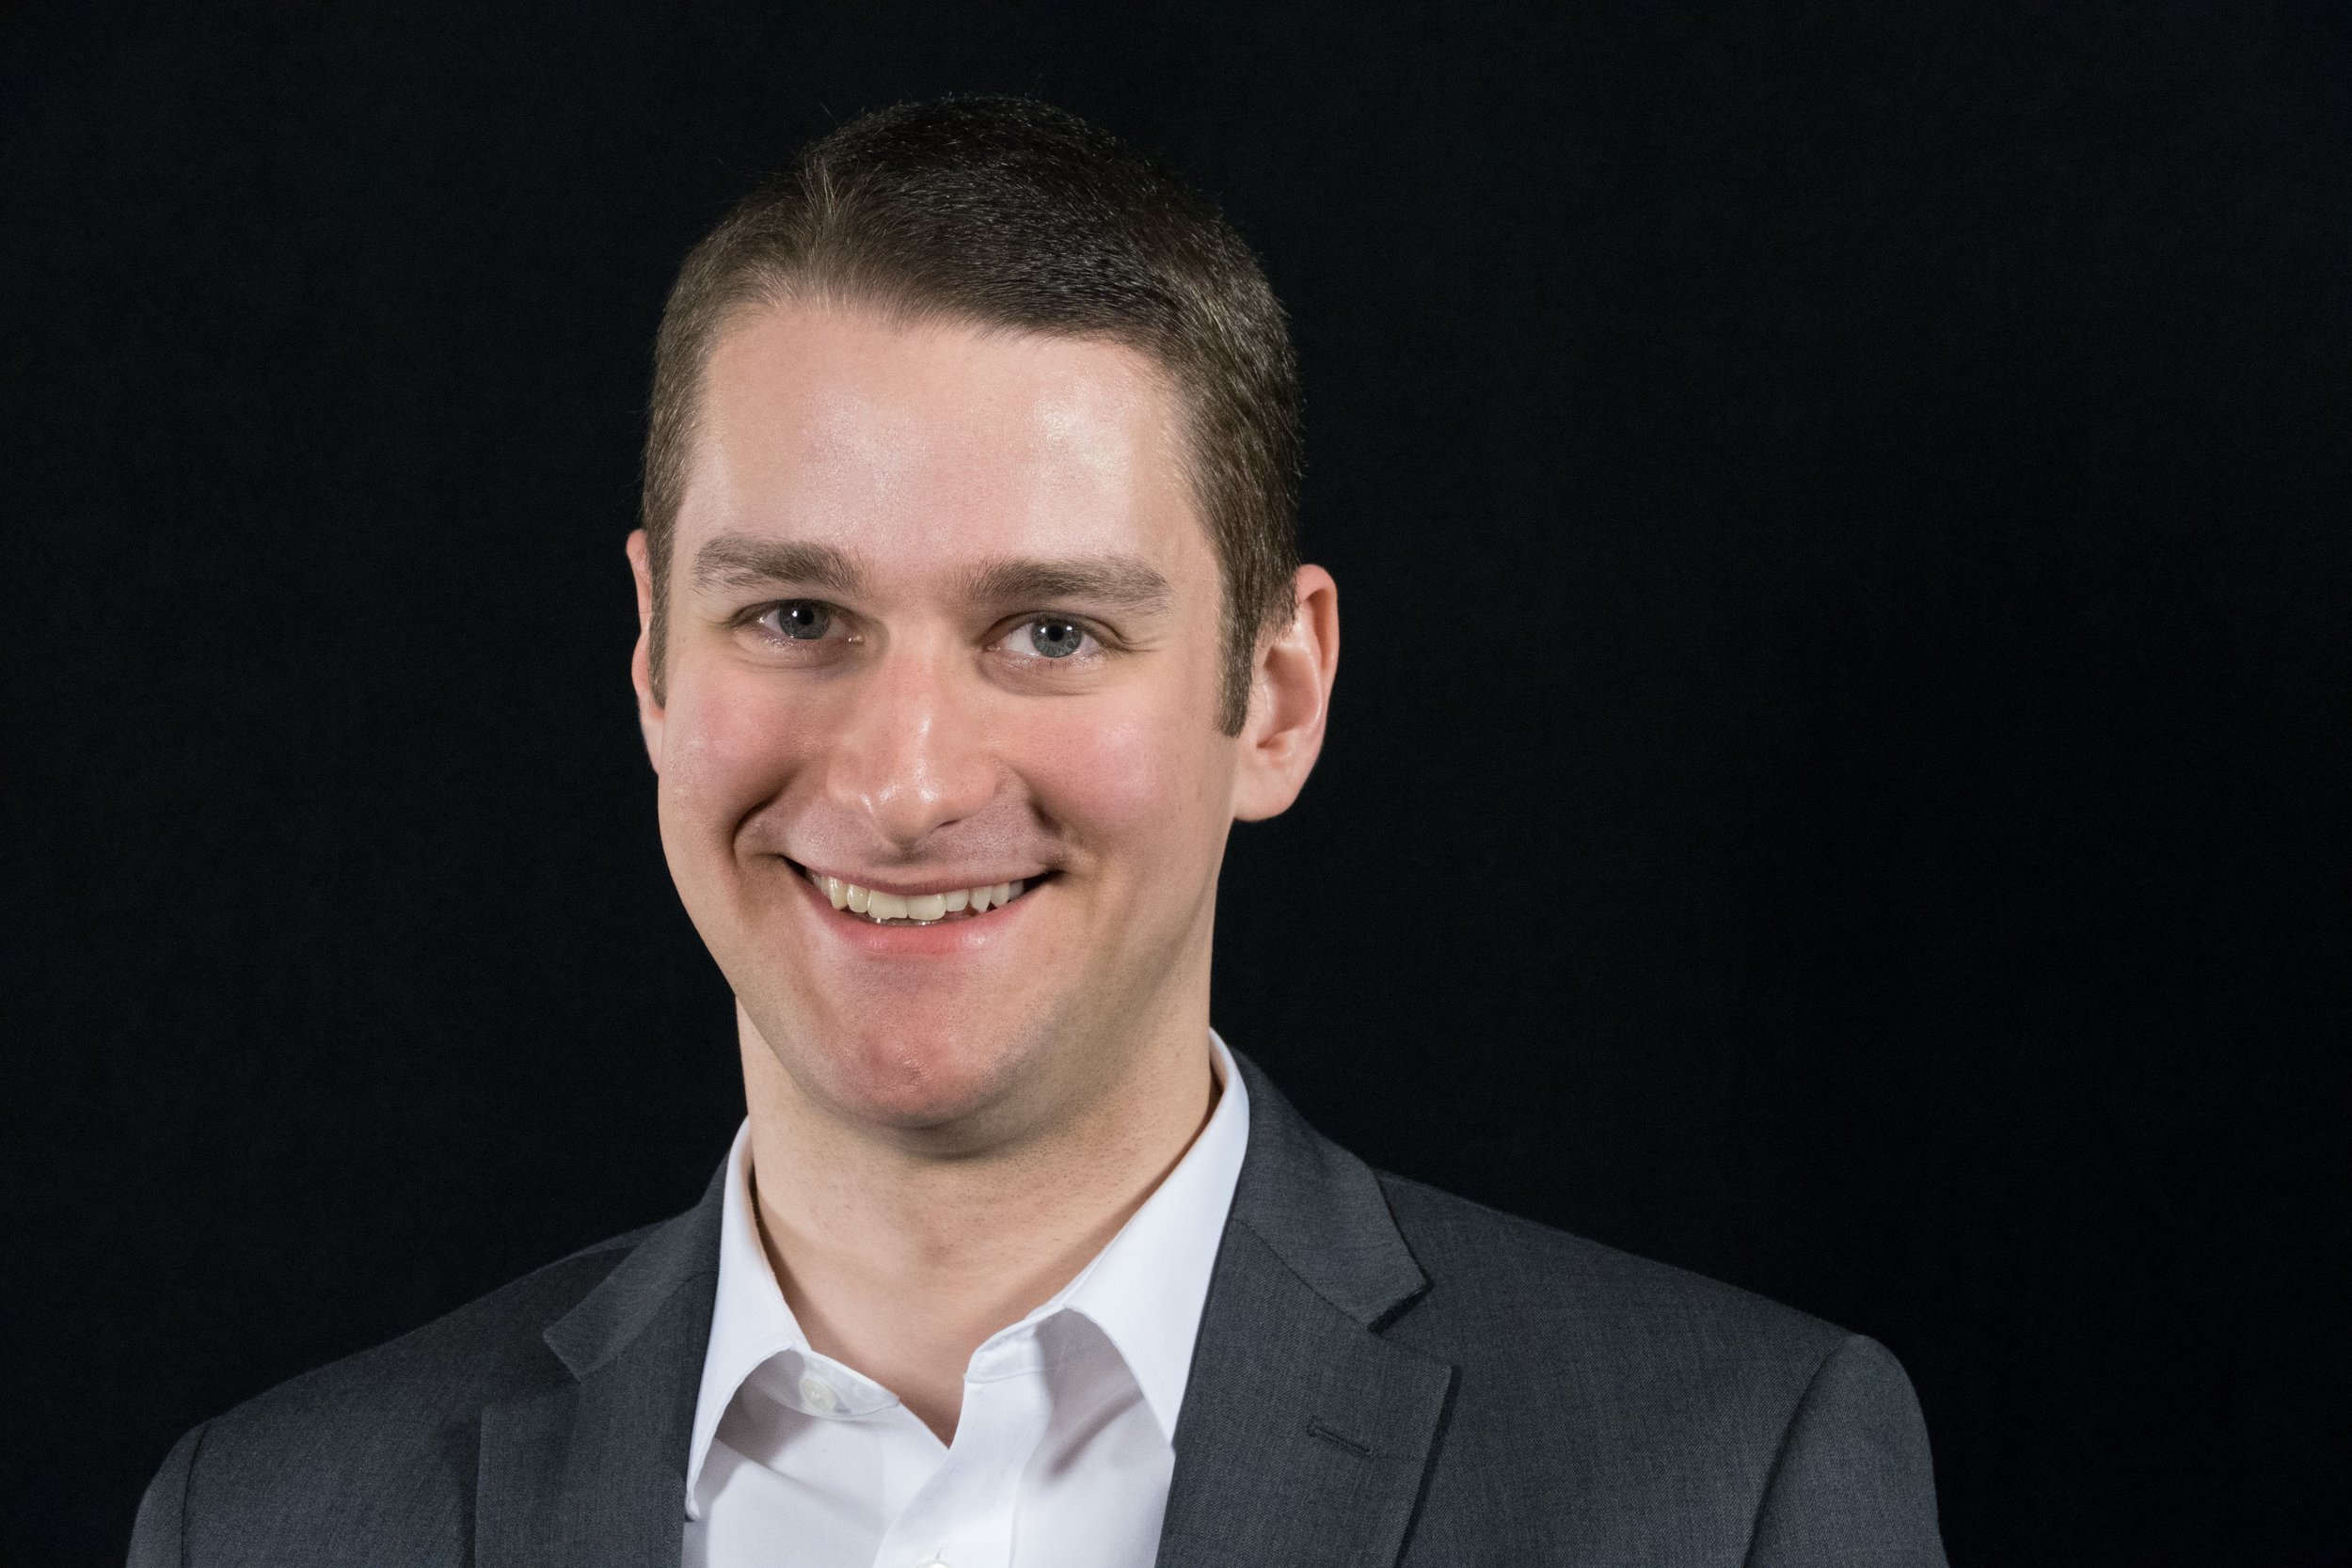 Alistair Glidden, Outreach Coordinator